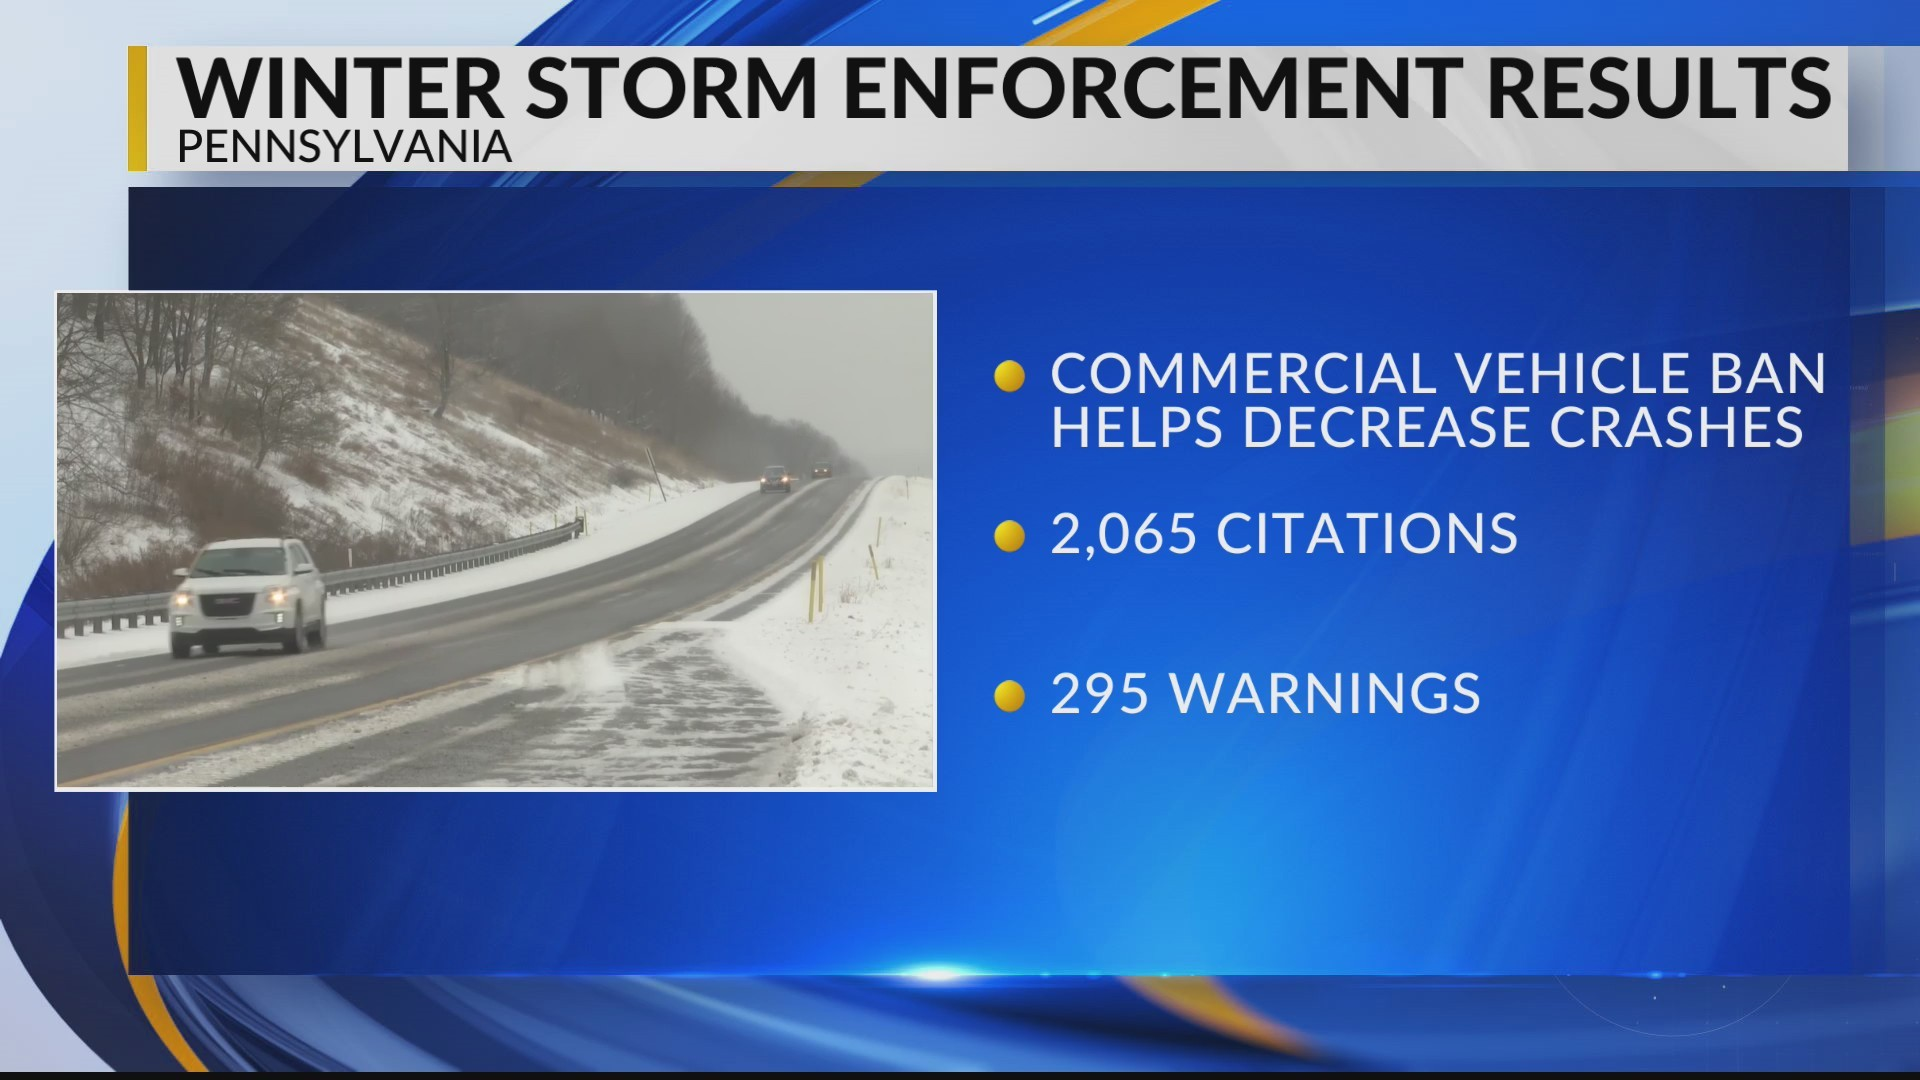 Winter storm enforcement results